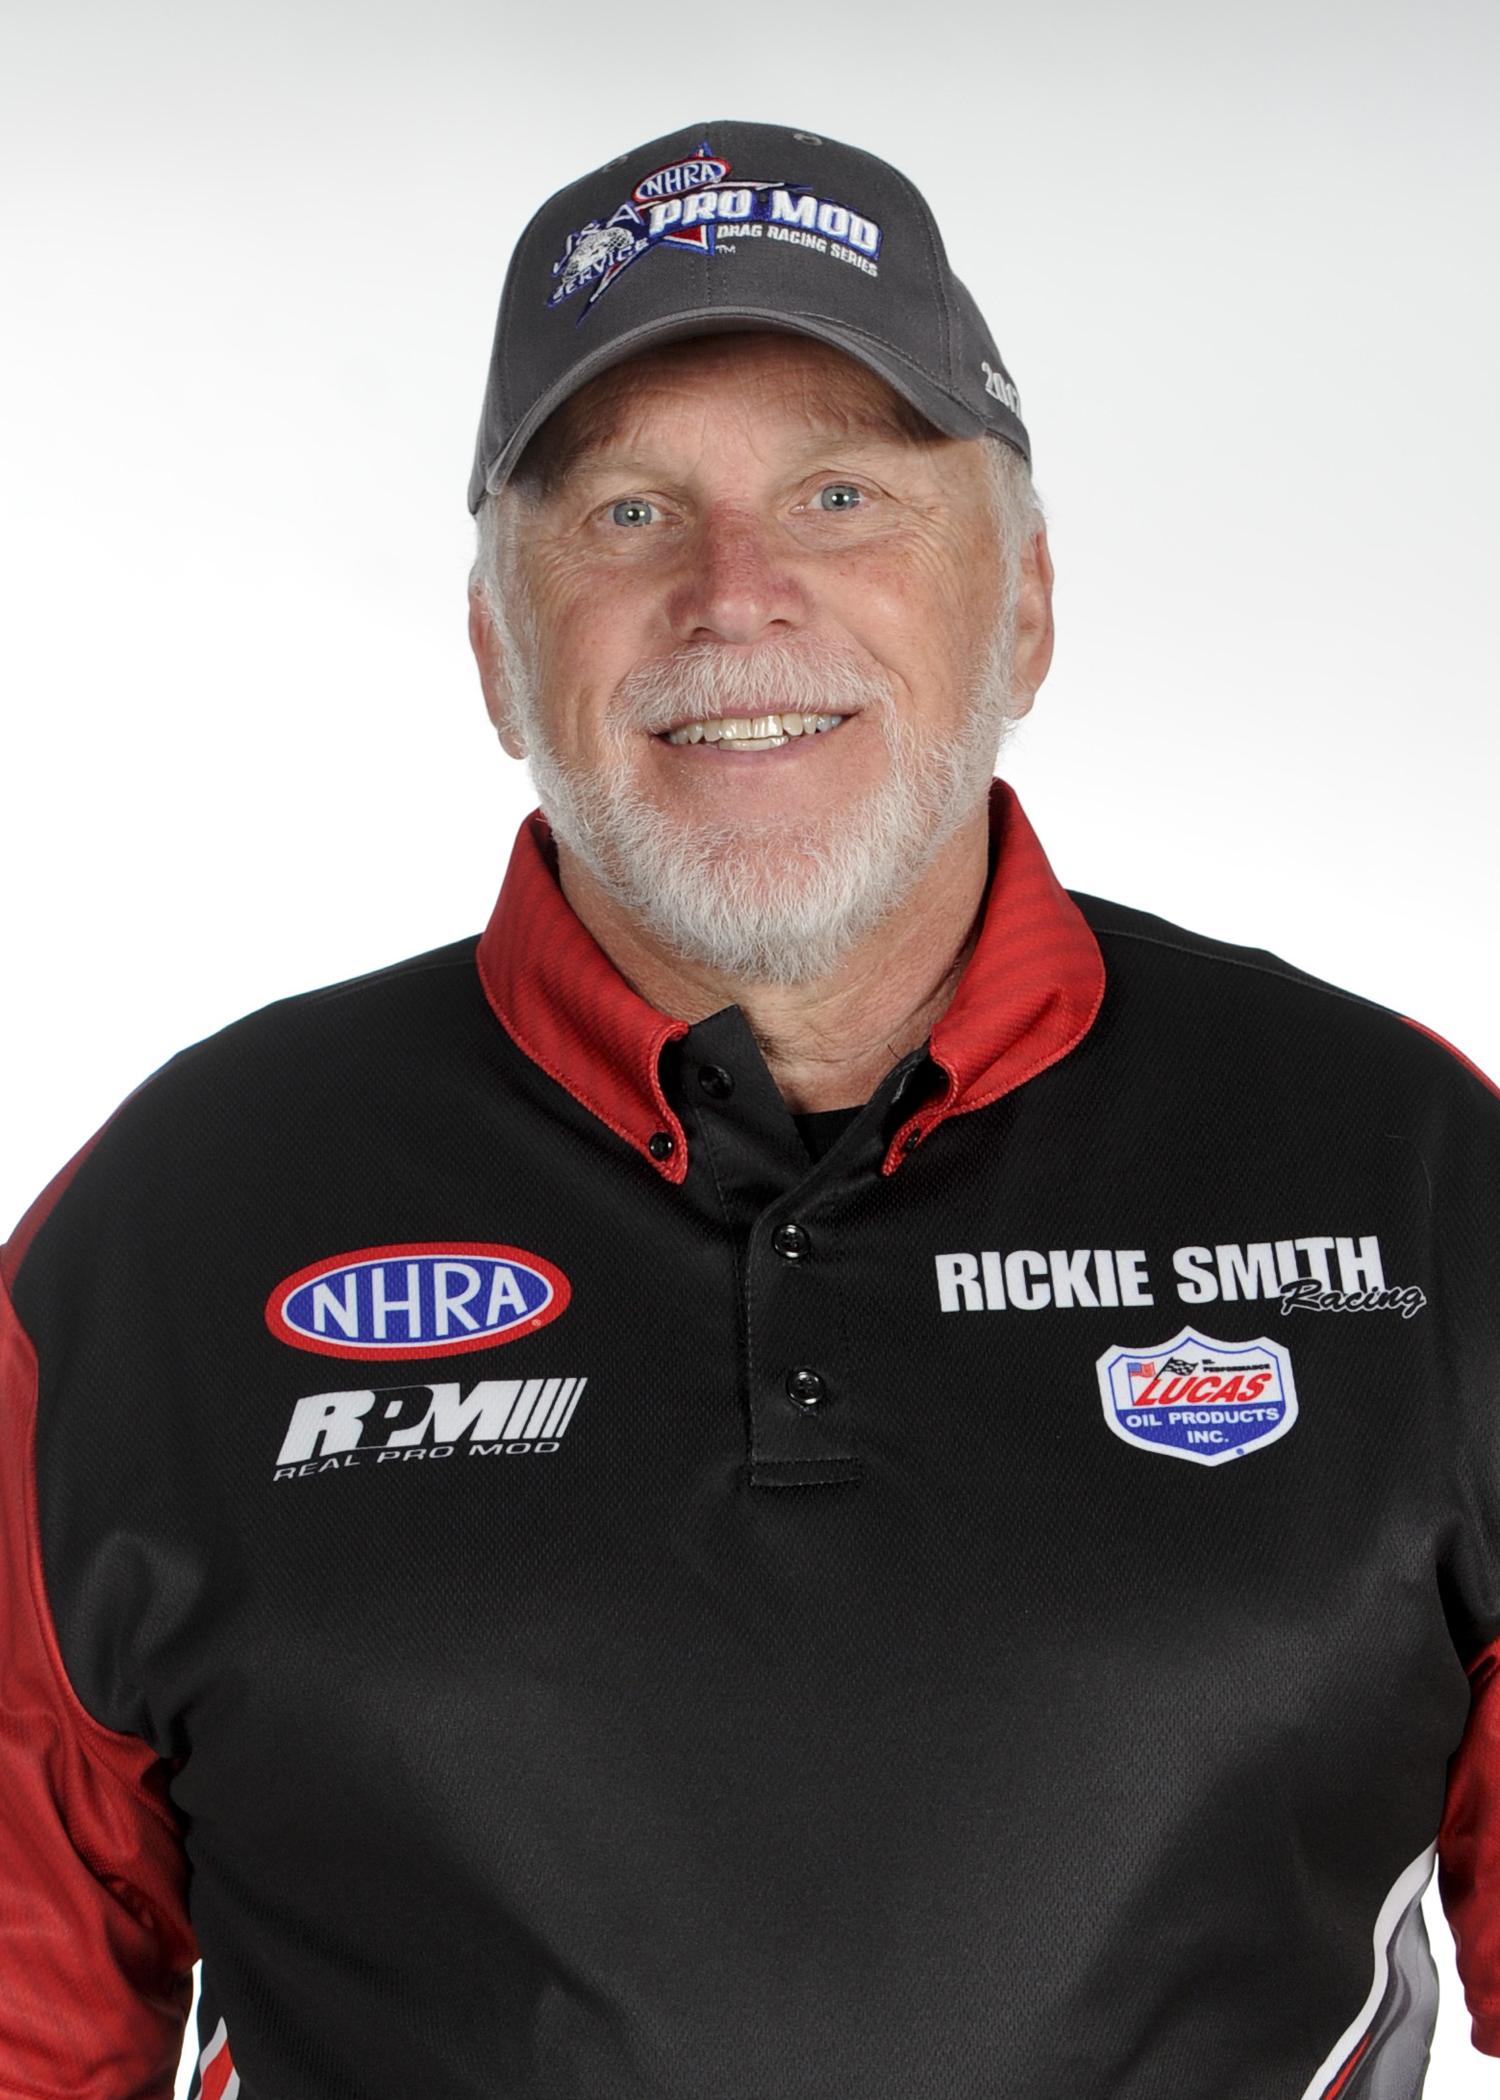 NHRA Pro Mod Rickie Smith